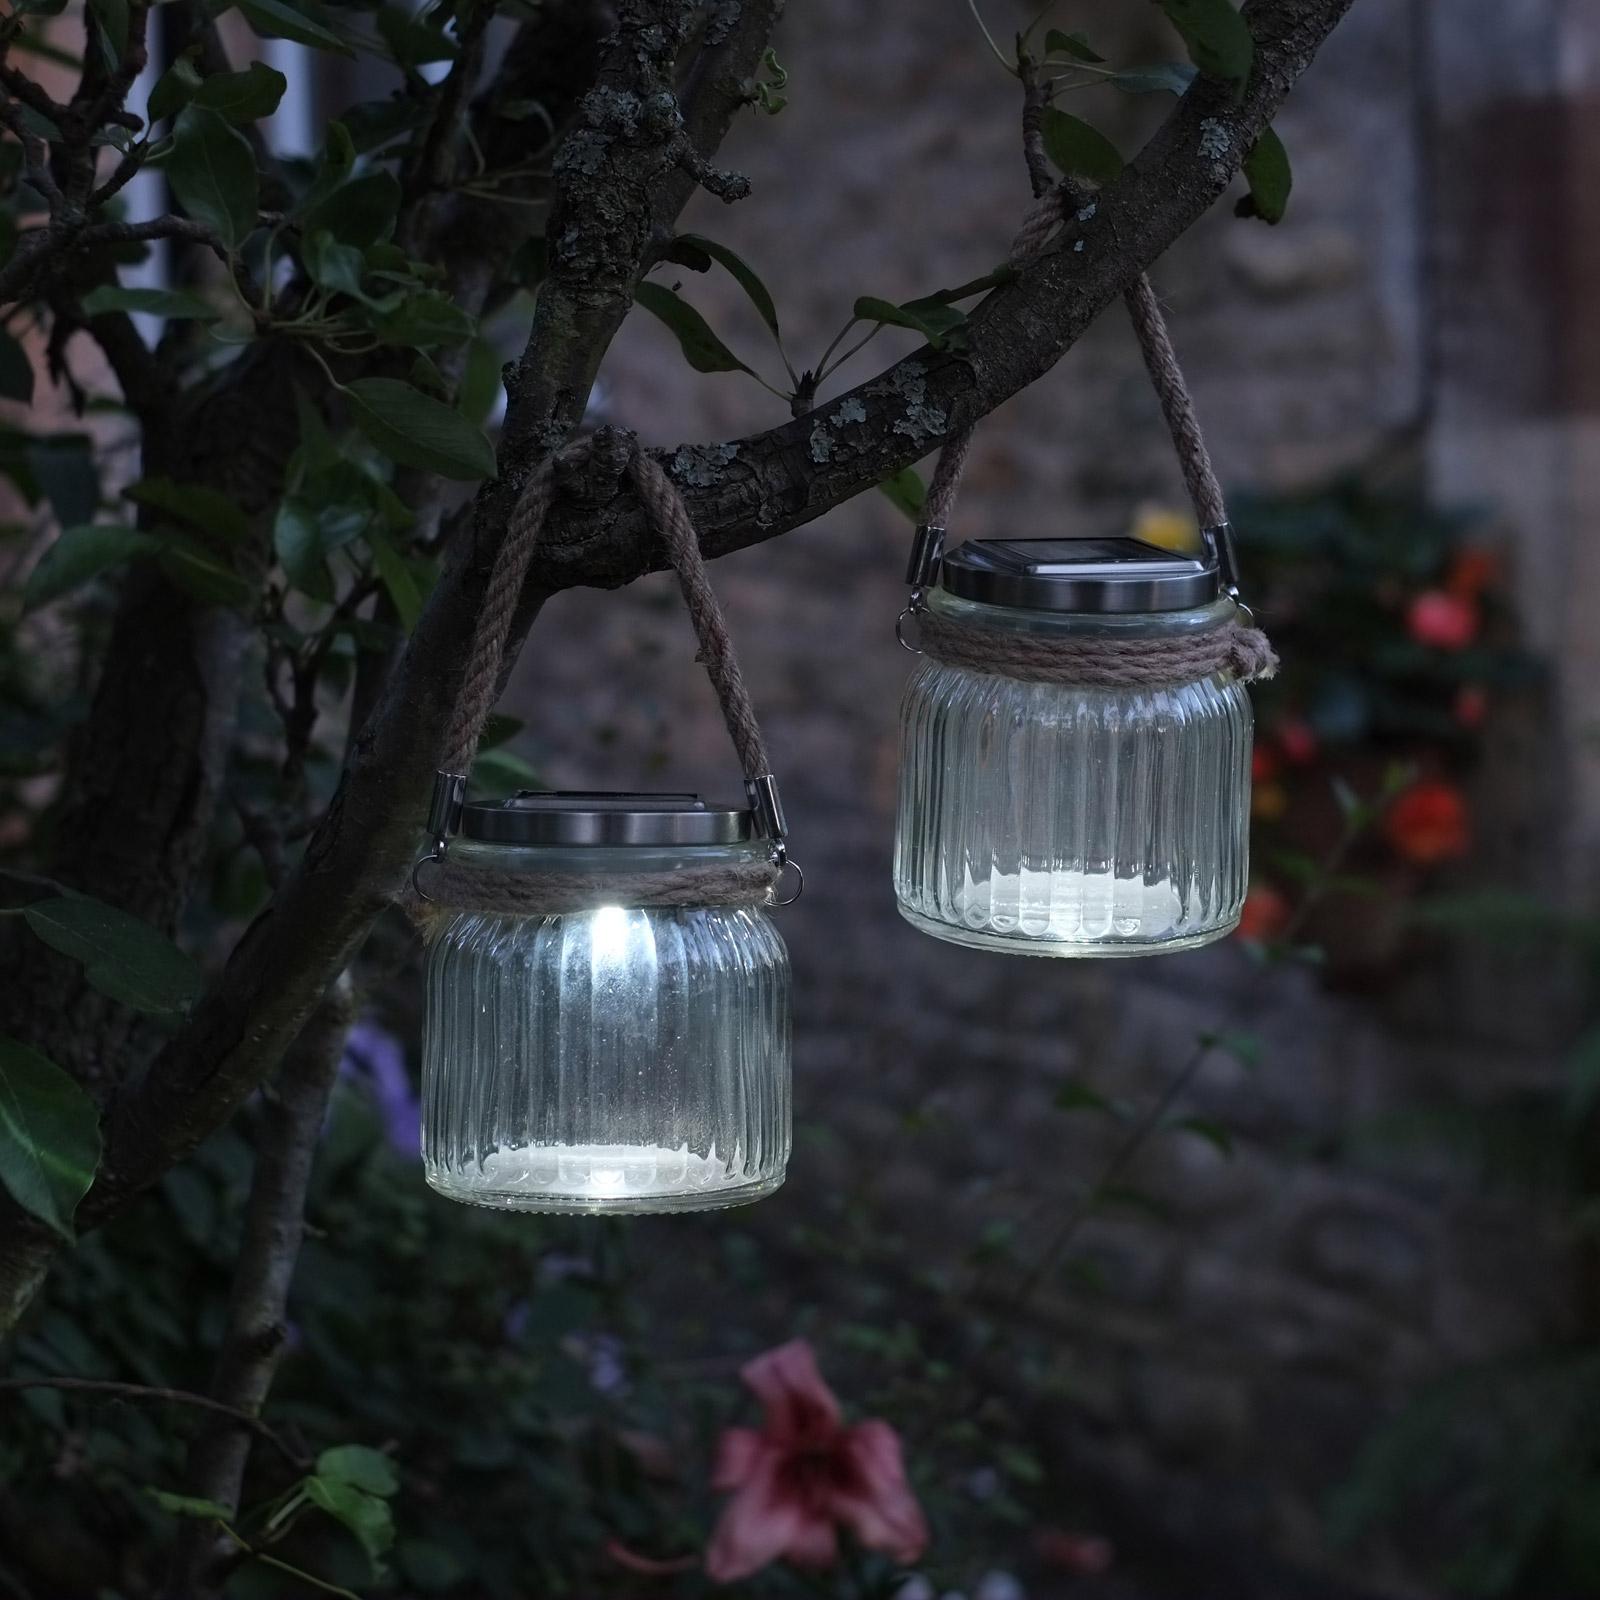 buy cheap solar garden lanterns compare lighting prices for best uk deals. Black Bedroom Furniture Sets. Home Design Ideas